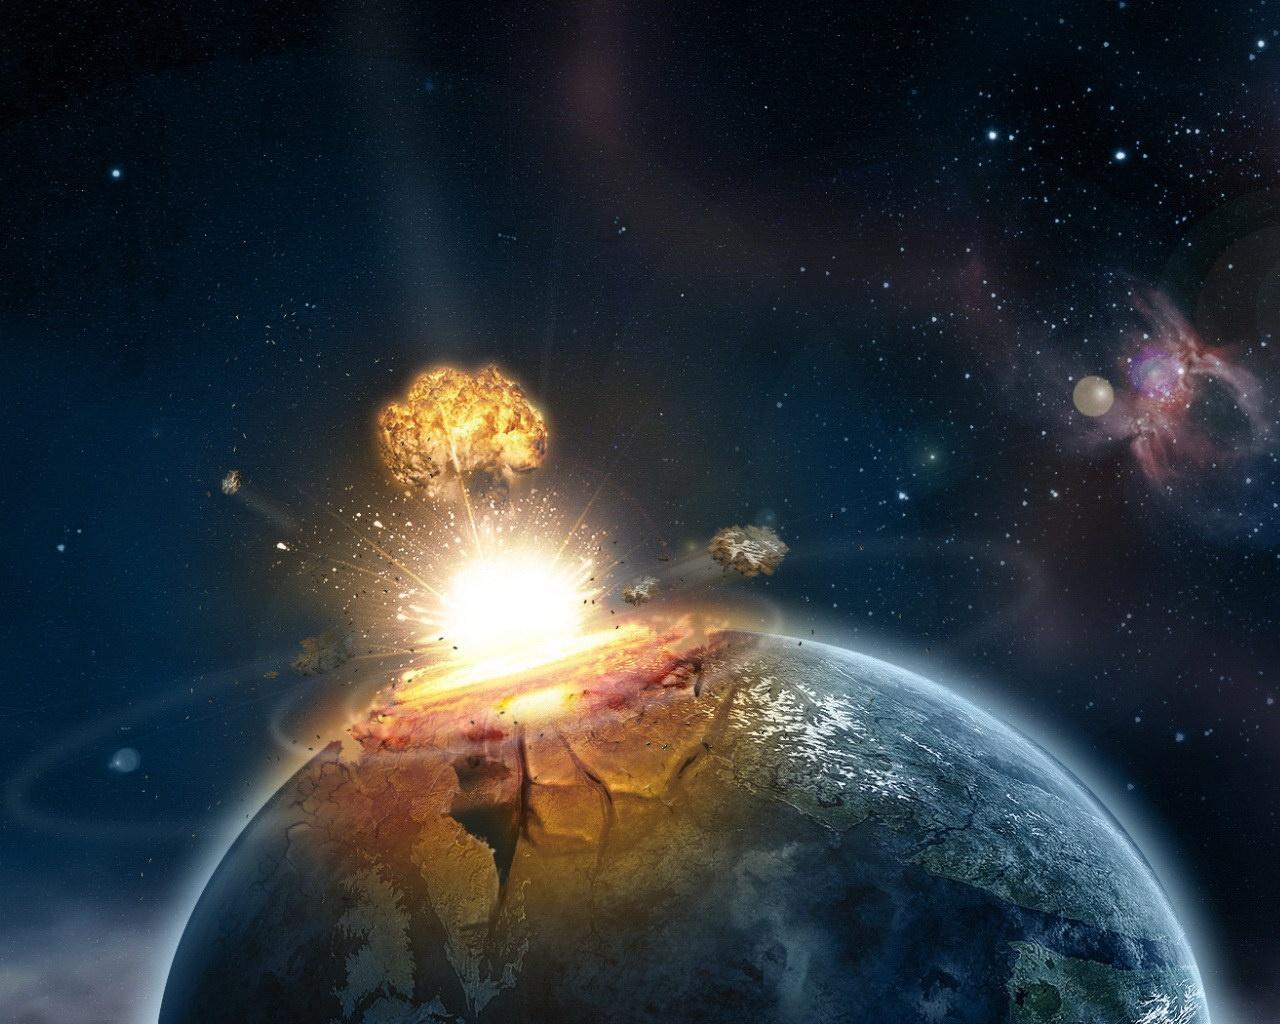 http://2.bp.blogspot.com/-7UvnQjKYxU0/URG10qOf-HI/AAAAAAAAAOg/QKo5FnNP2w8/s1600/Earth+Impact+2.jpg